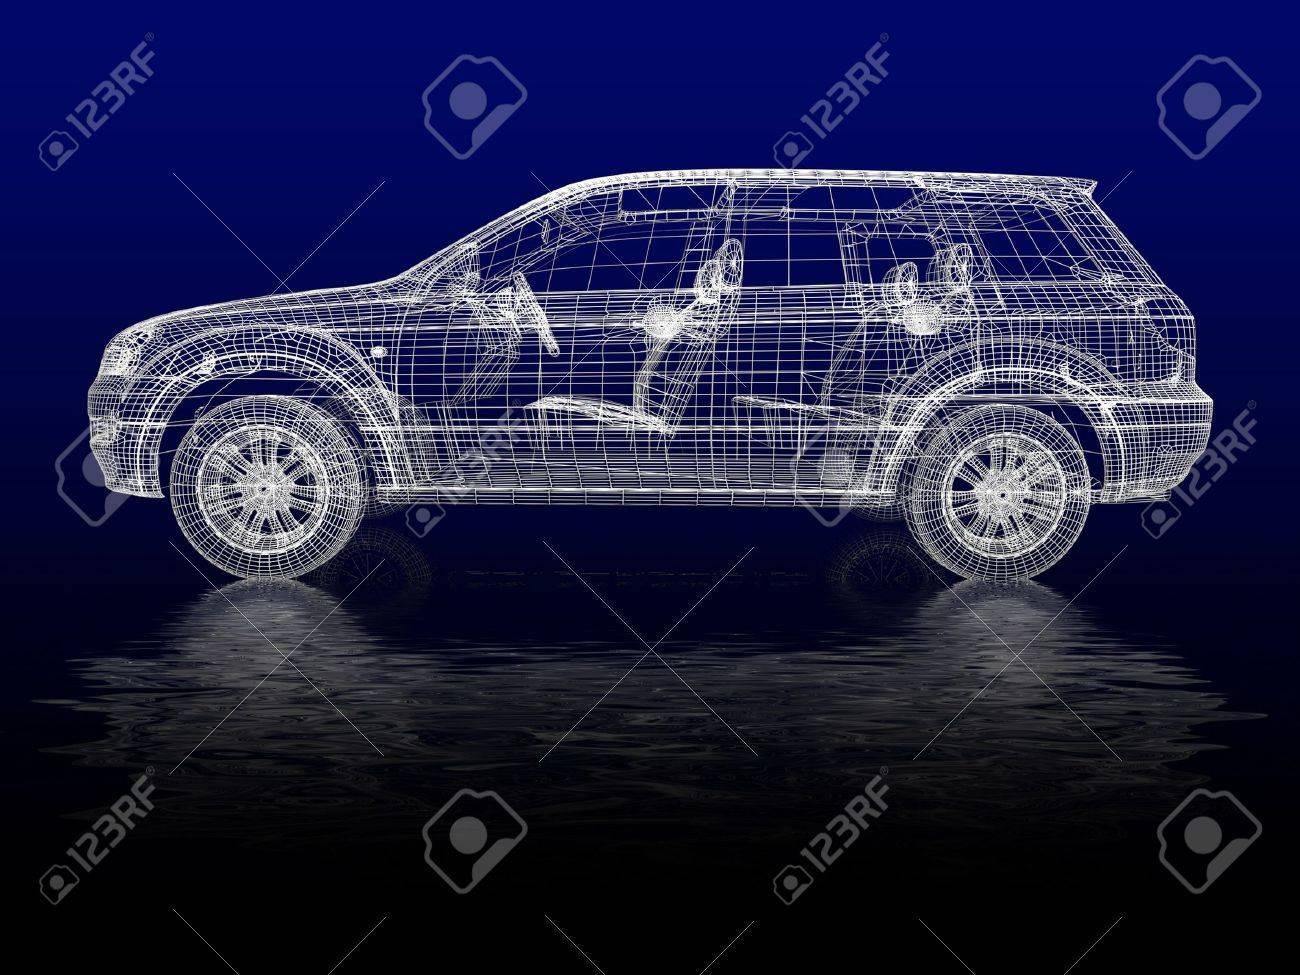 Car model Stock Photo - 11326130